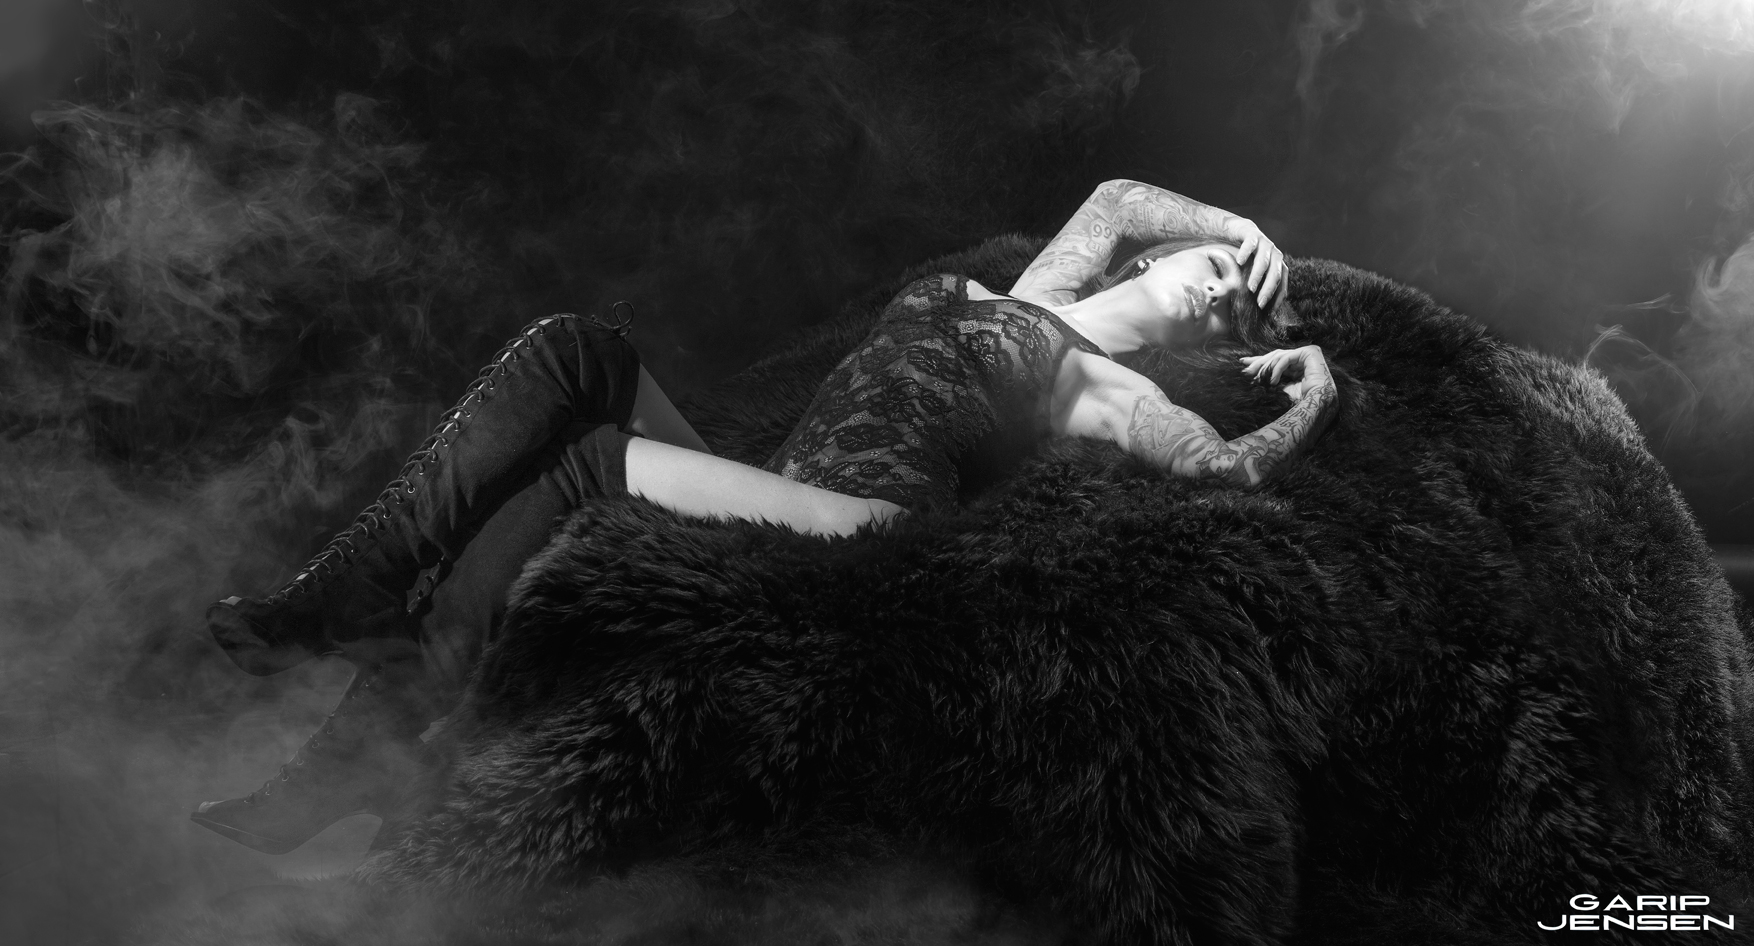 Swedish tattooed model wearing a black lace body